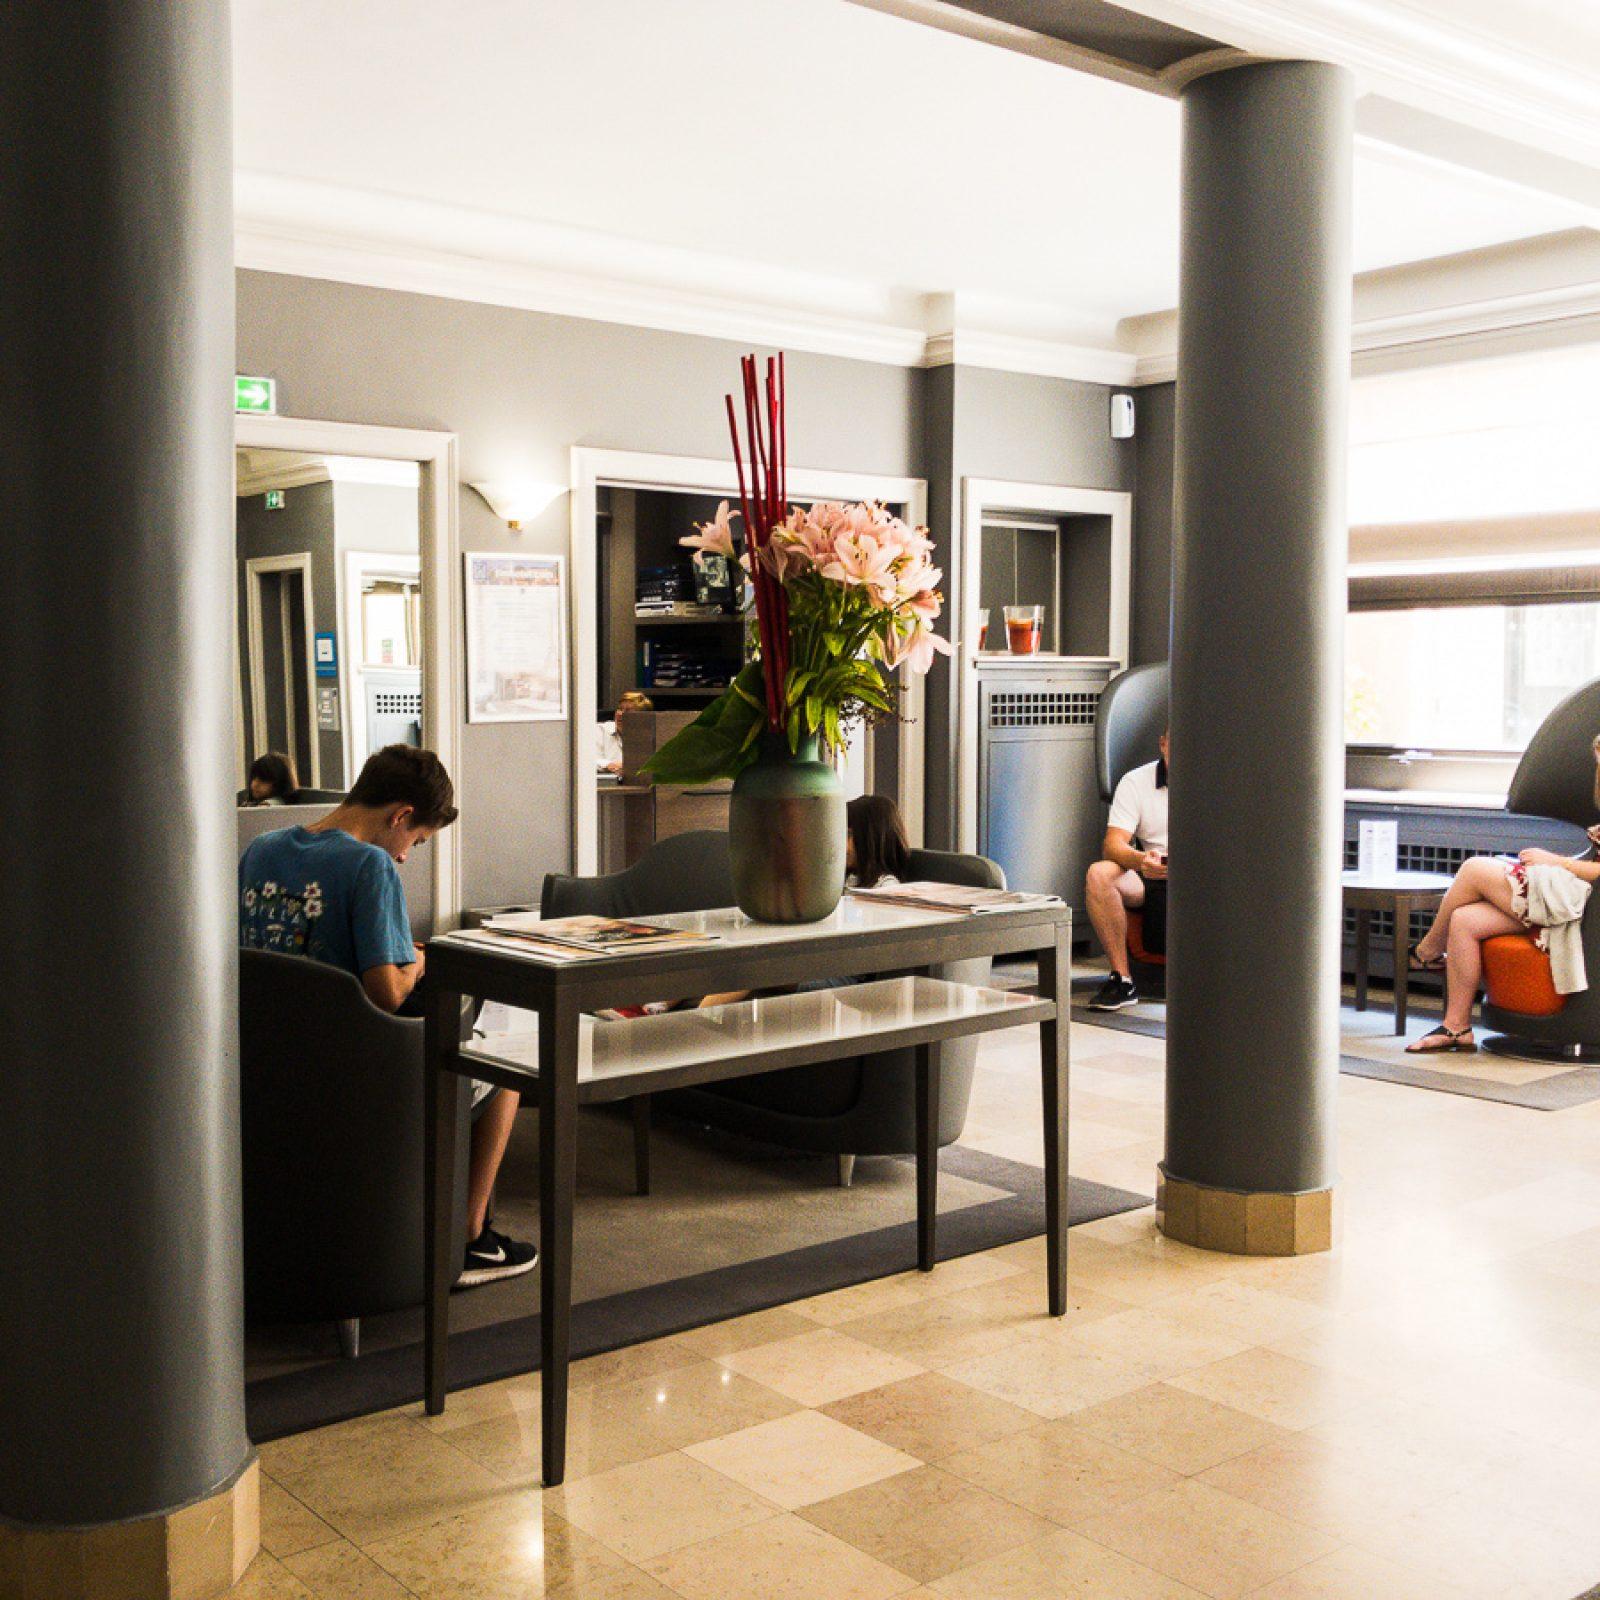 tim-hotel opera blanche hotel parigi 006